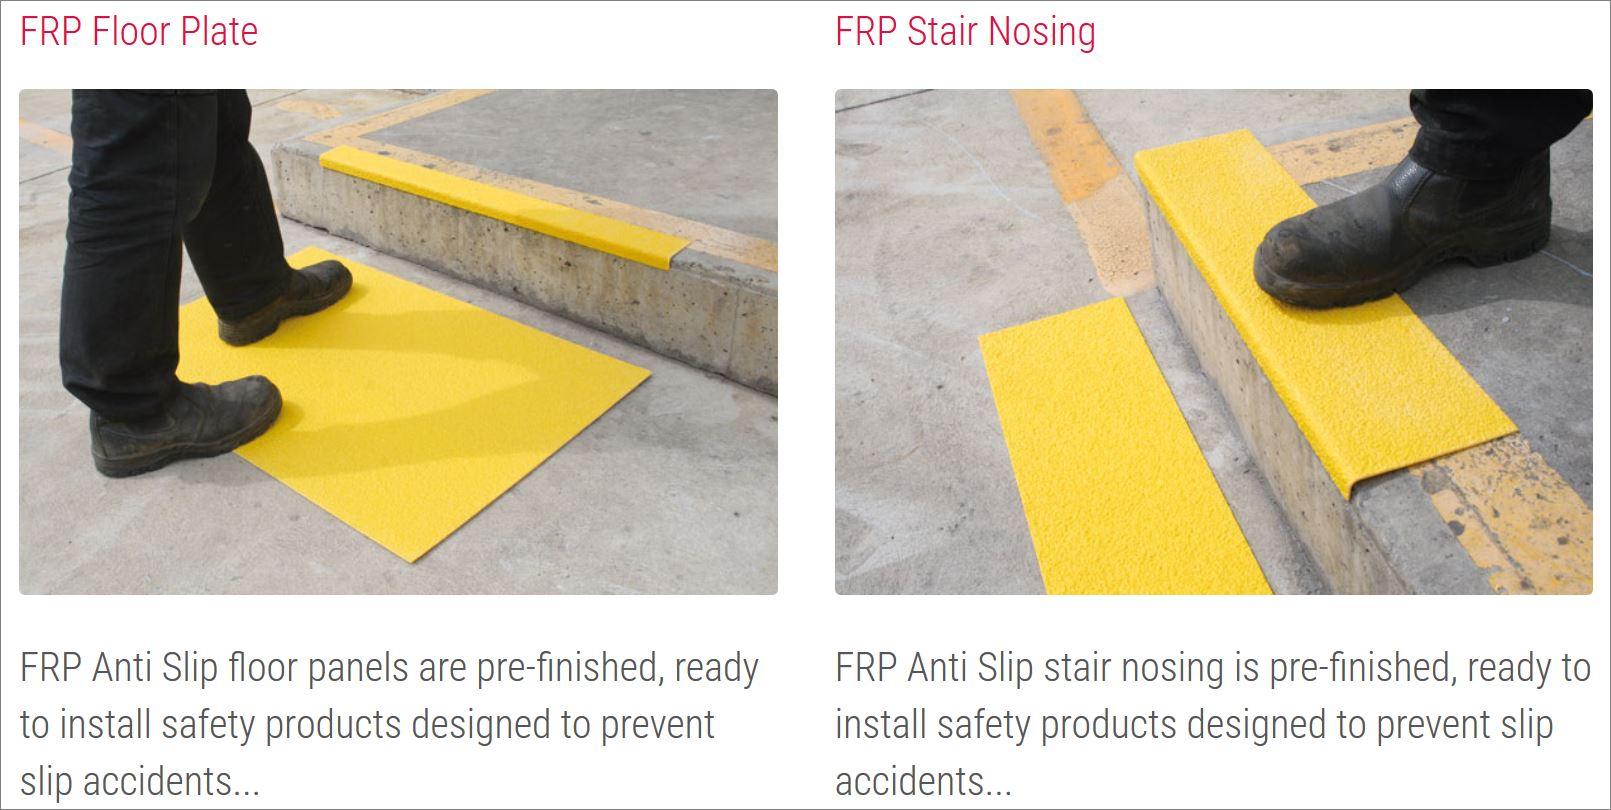 Fiberglass Reinforced Plastic Anti-Slip Sheeting